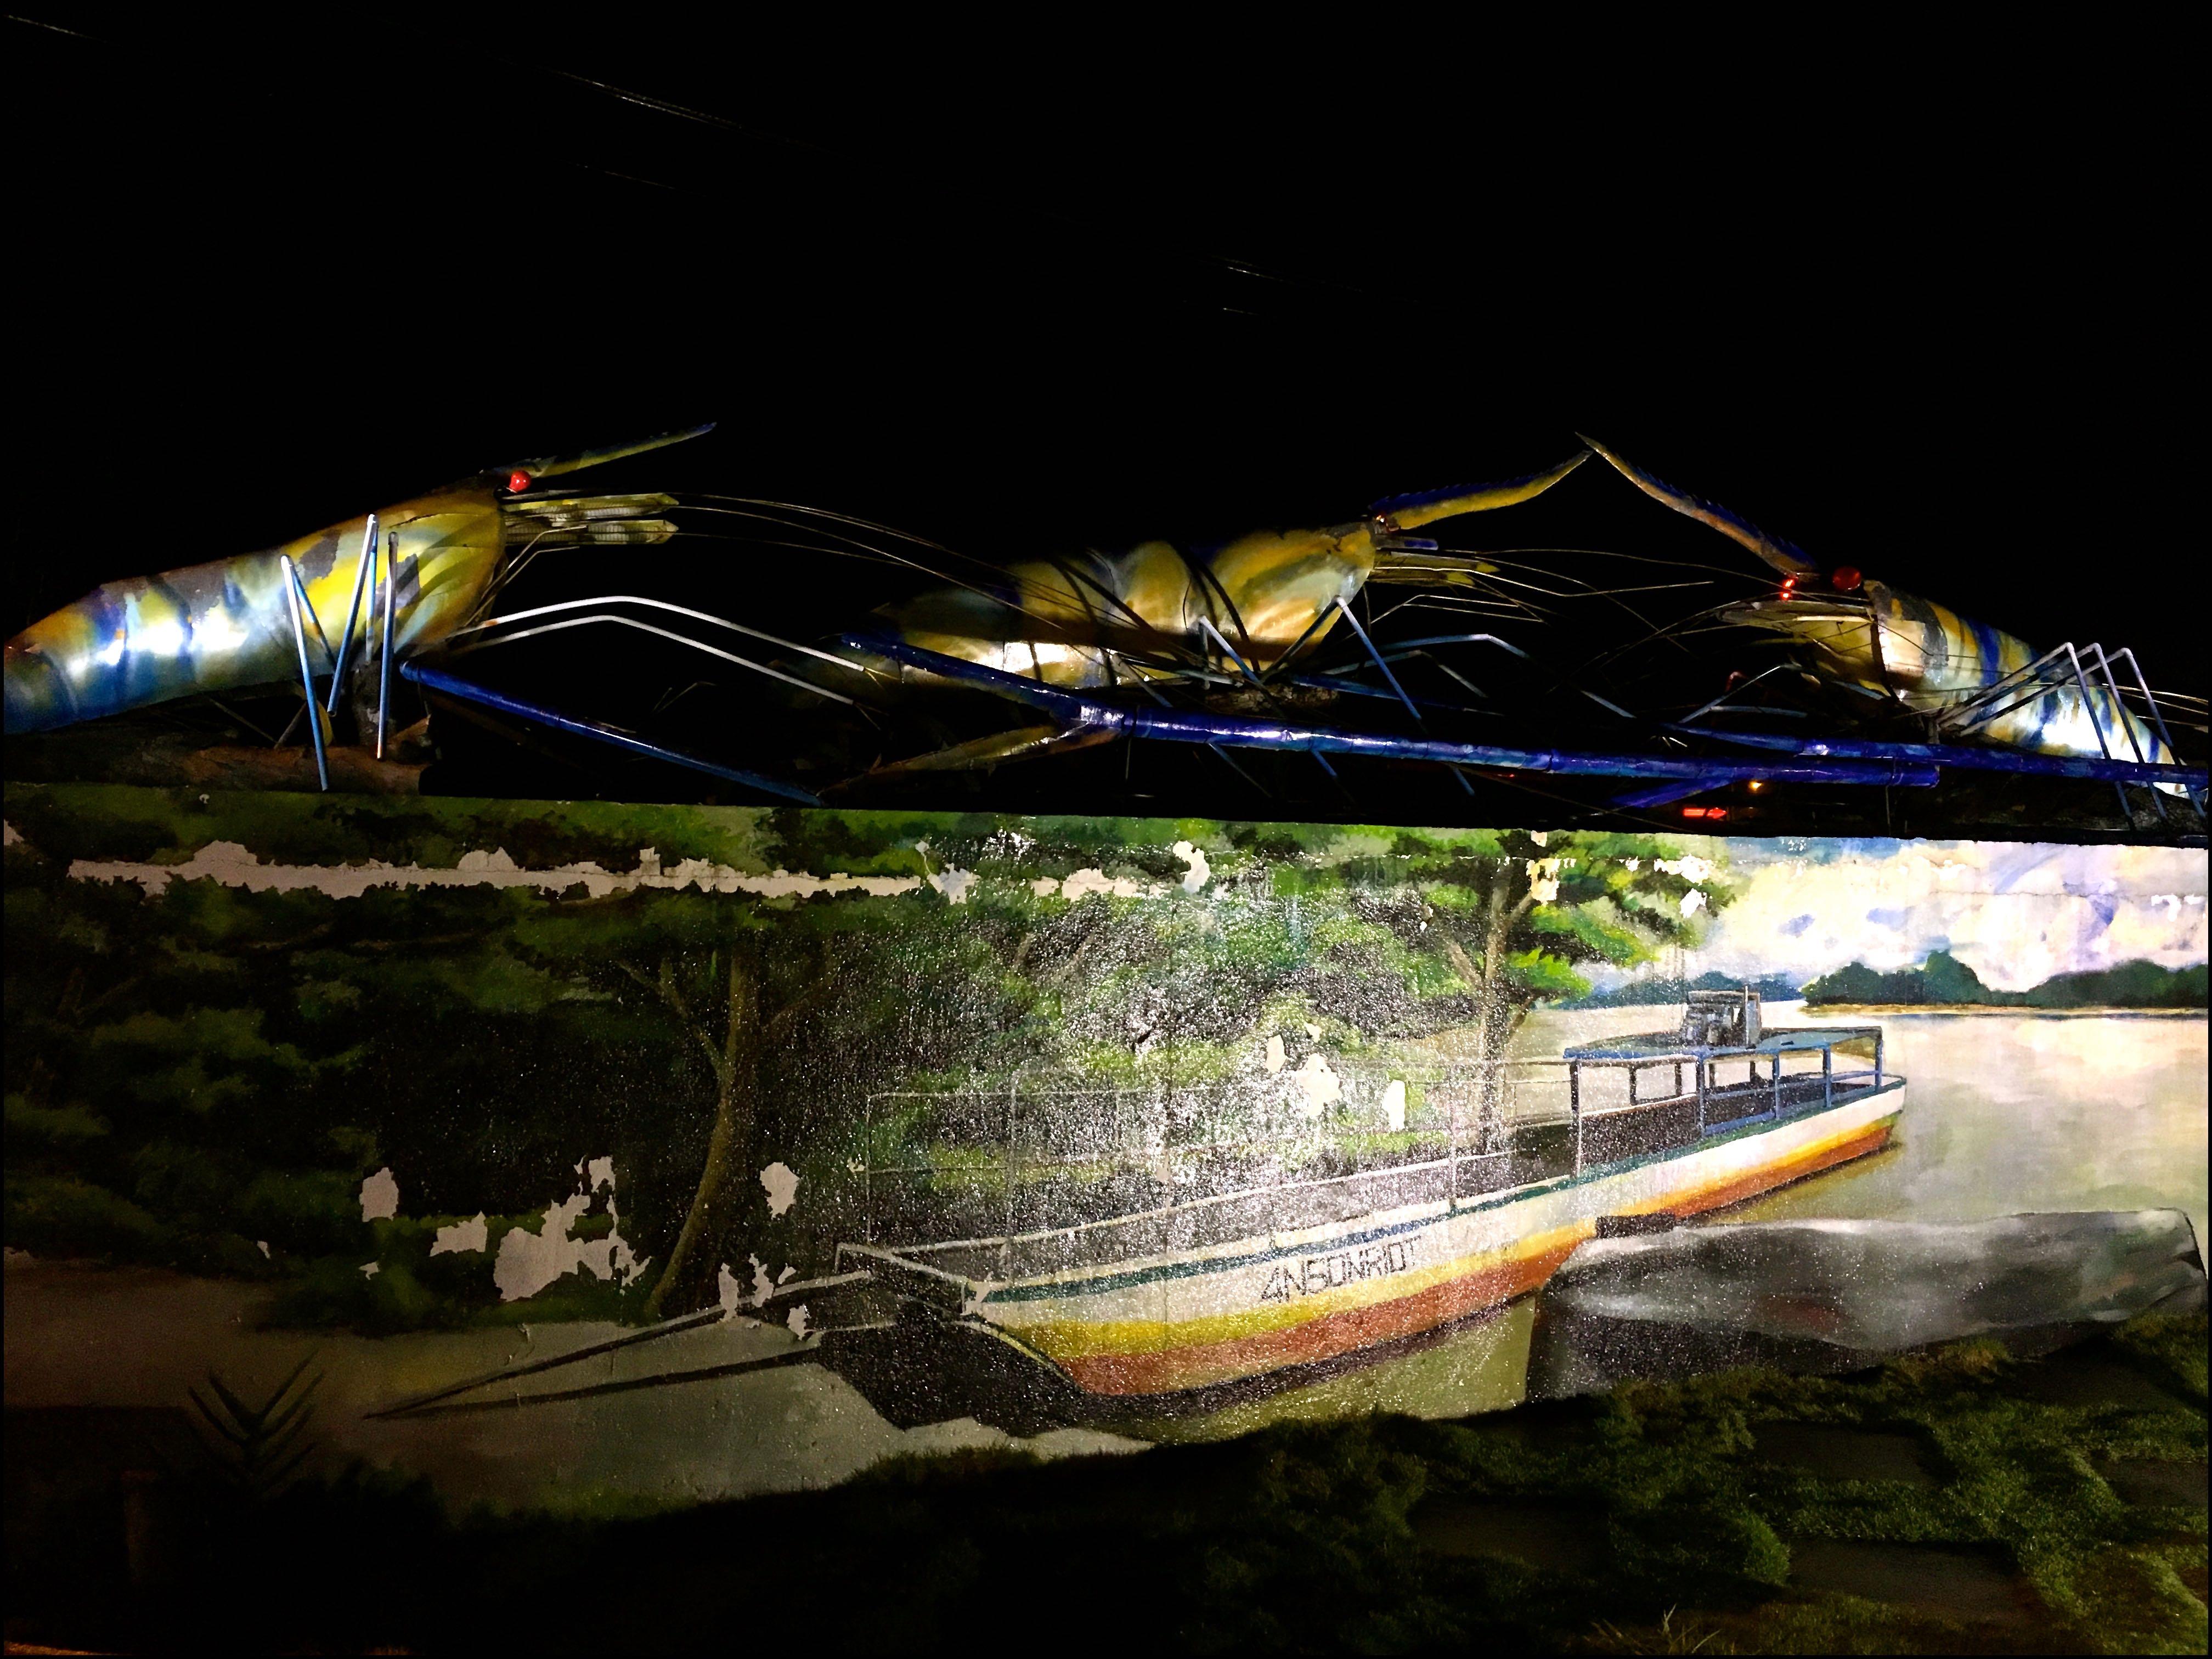 BCG Tour Teluk Intan Dataran Udang Galah